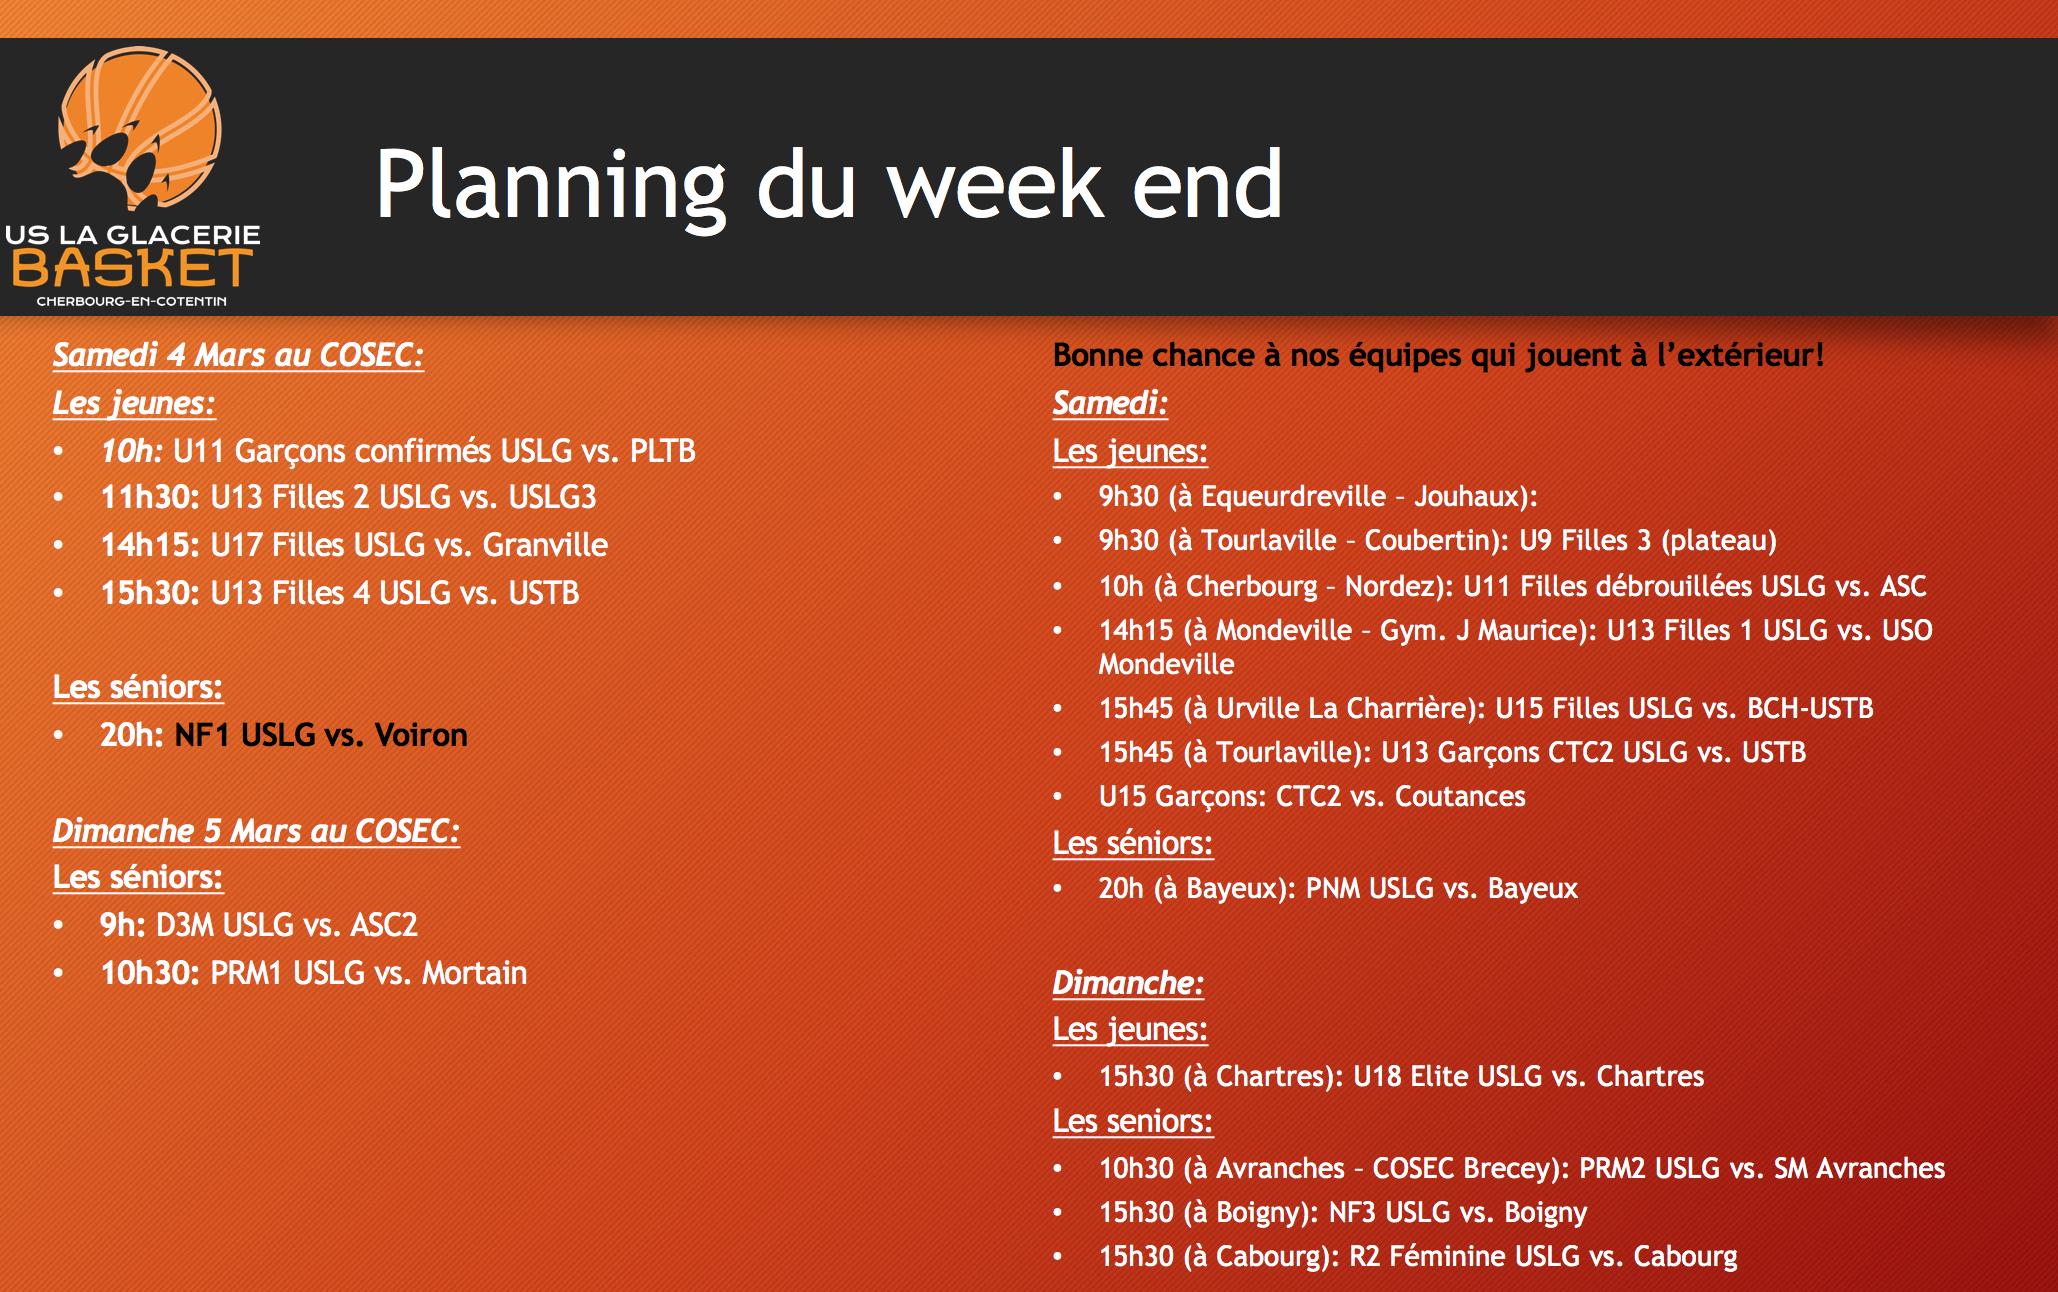 Planning du week end 4 & 5 Mars 2017